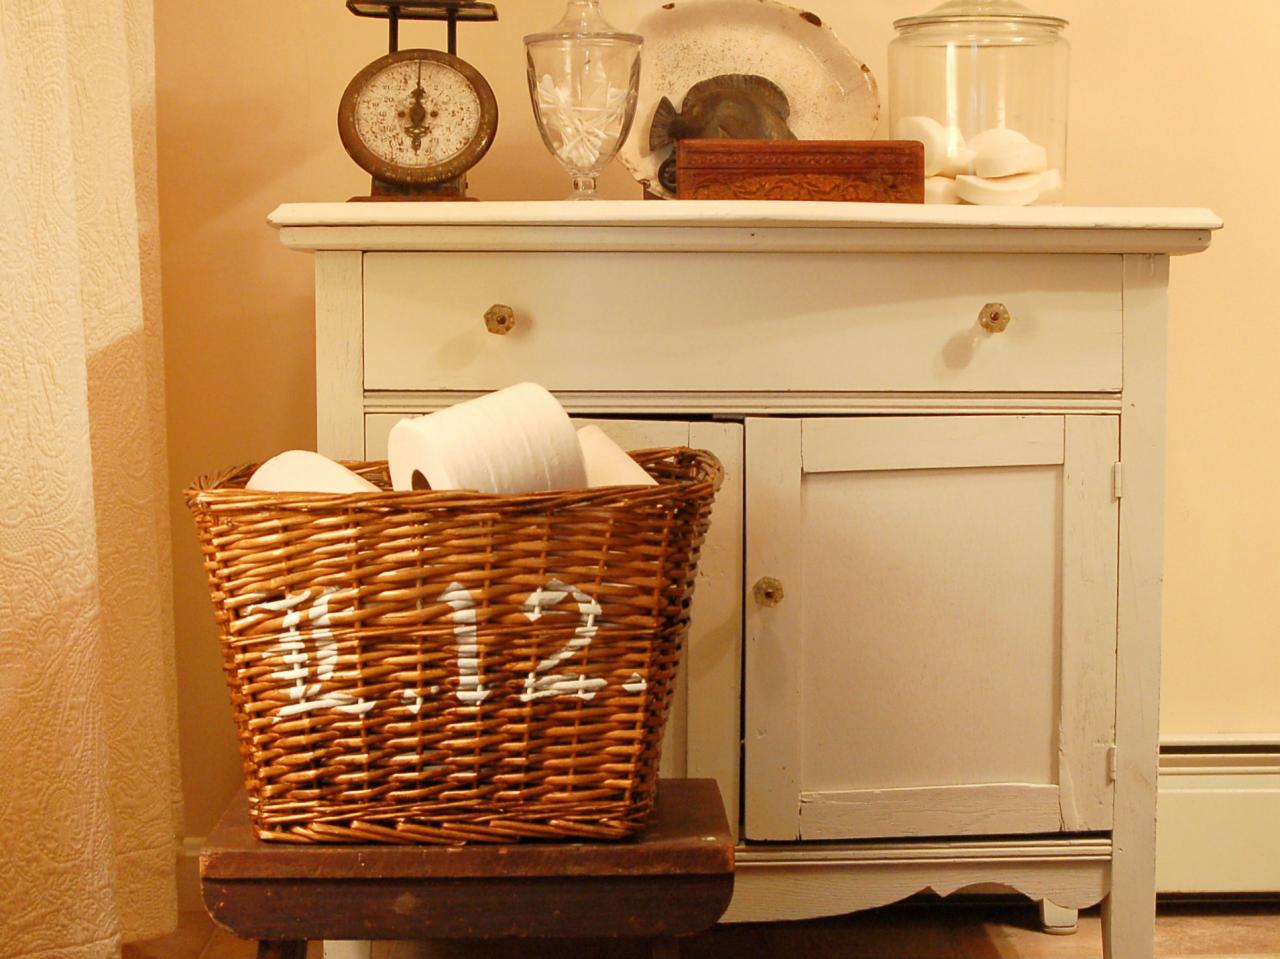 Simple stenciled basket hgtv for Basket bathroom accessories